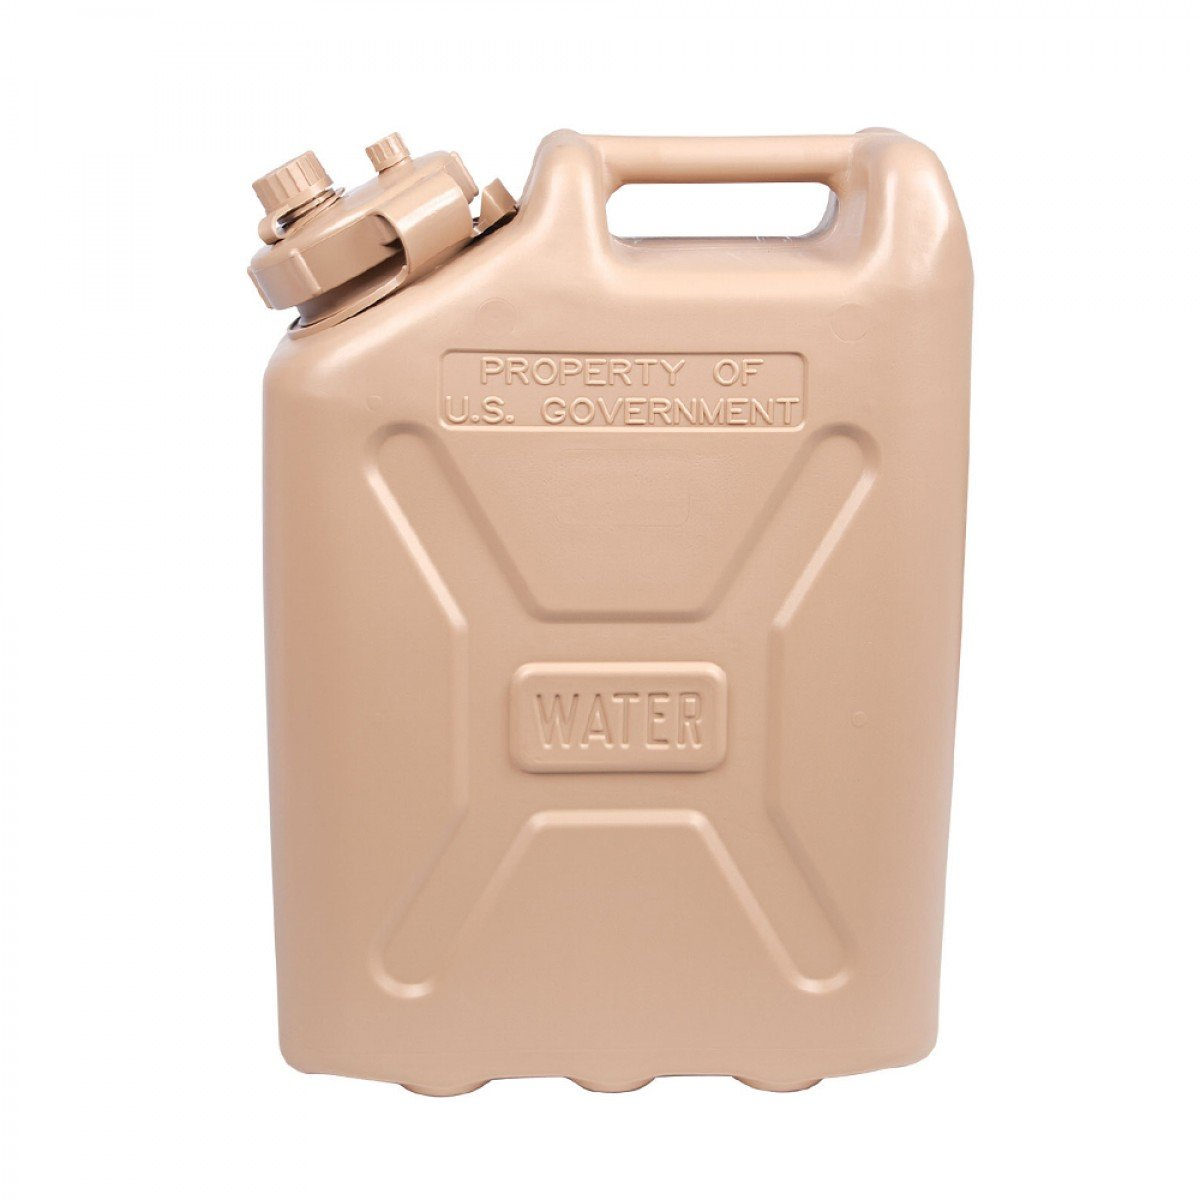 LCI Plastic Water Can, Desert Sand, 5-gallon by LCI